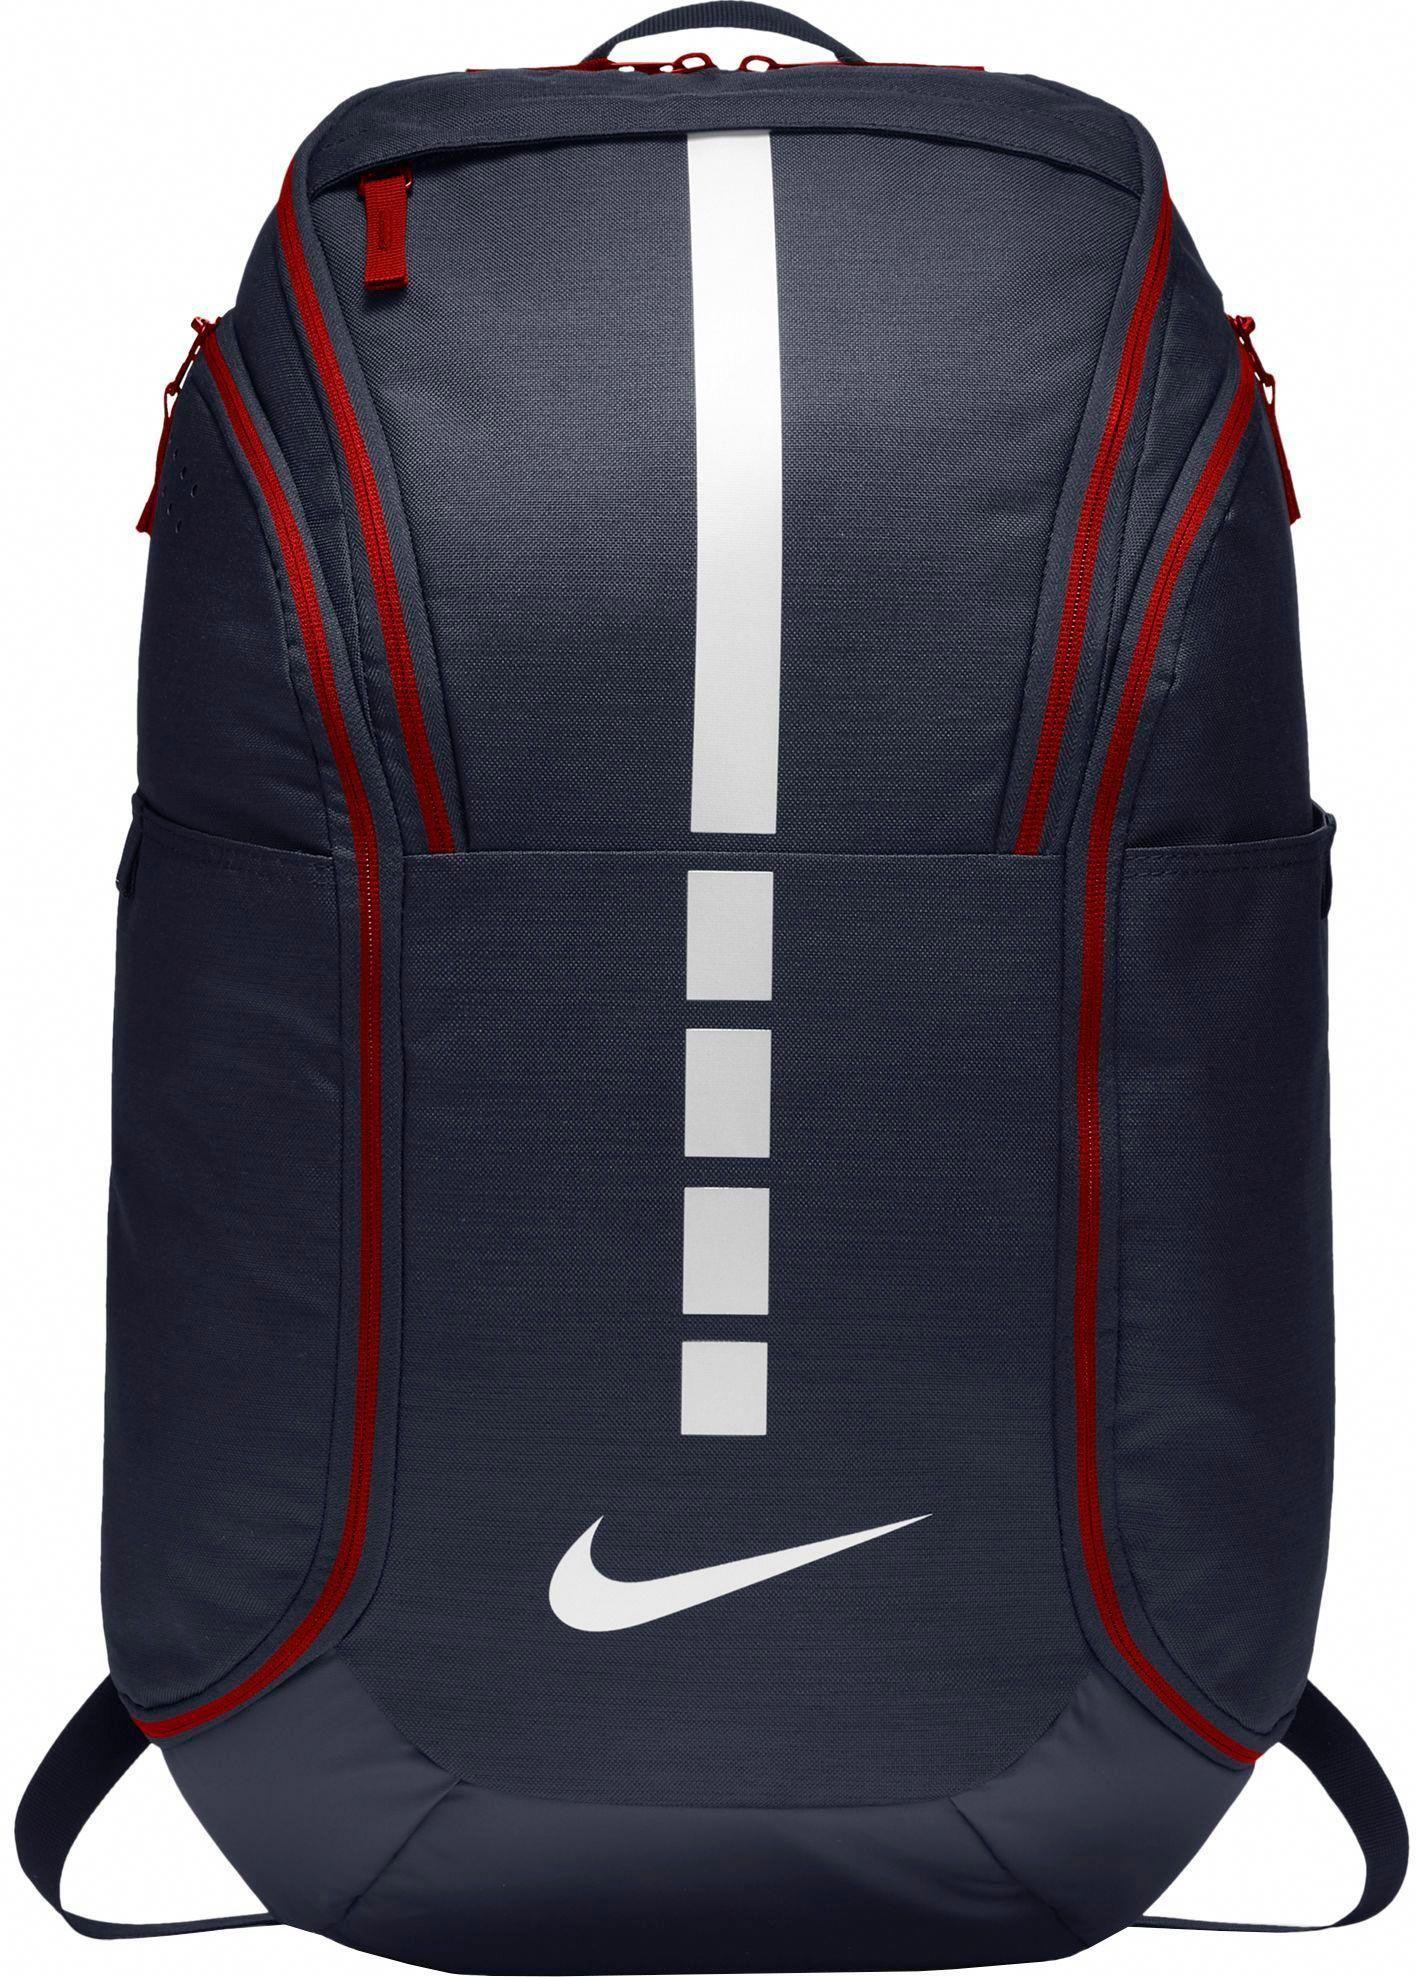 Nike Elite Pro Basketball Backpack Basketball Backpack Nike Elite Backpack Basketball Bag